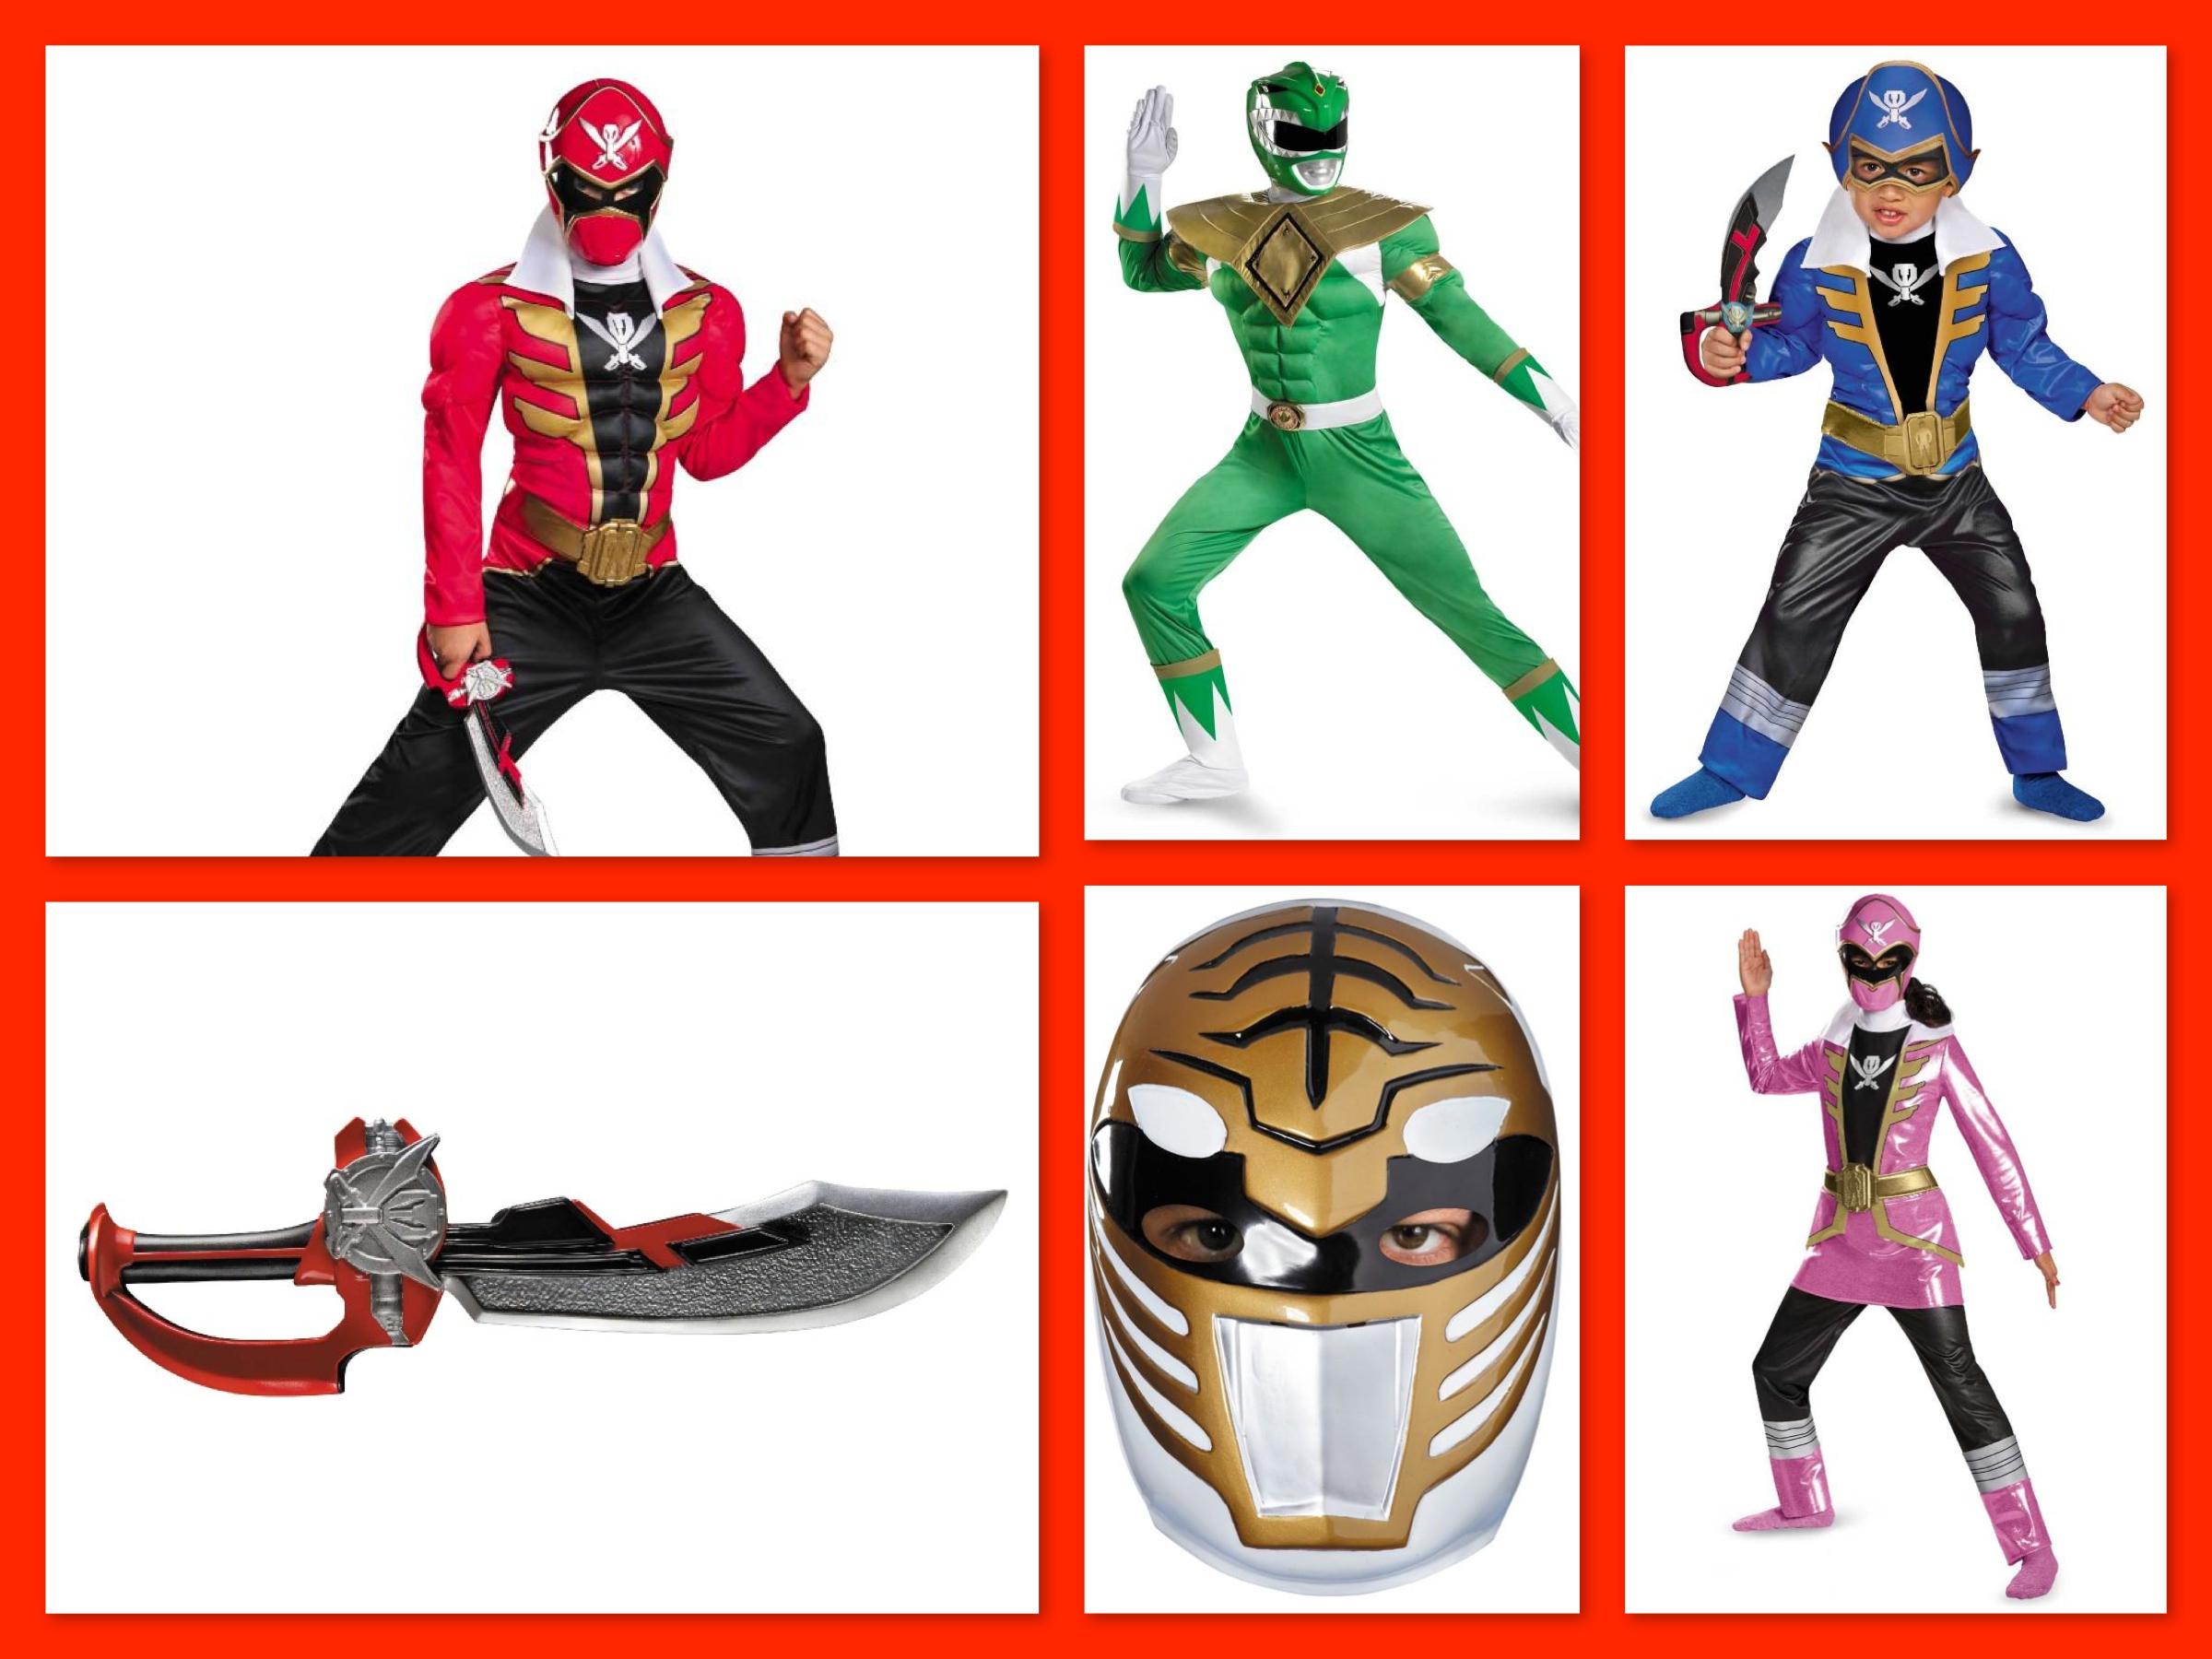 Power Rangers Family Costumes, Trending Halloween Costumes